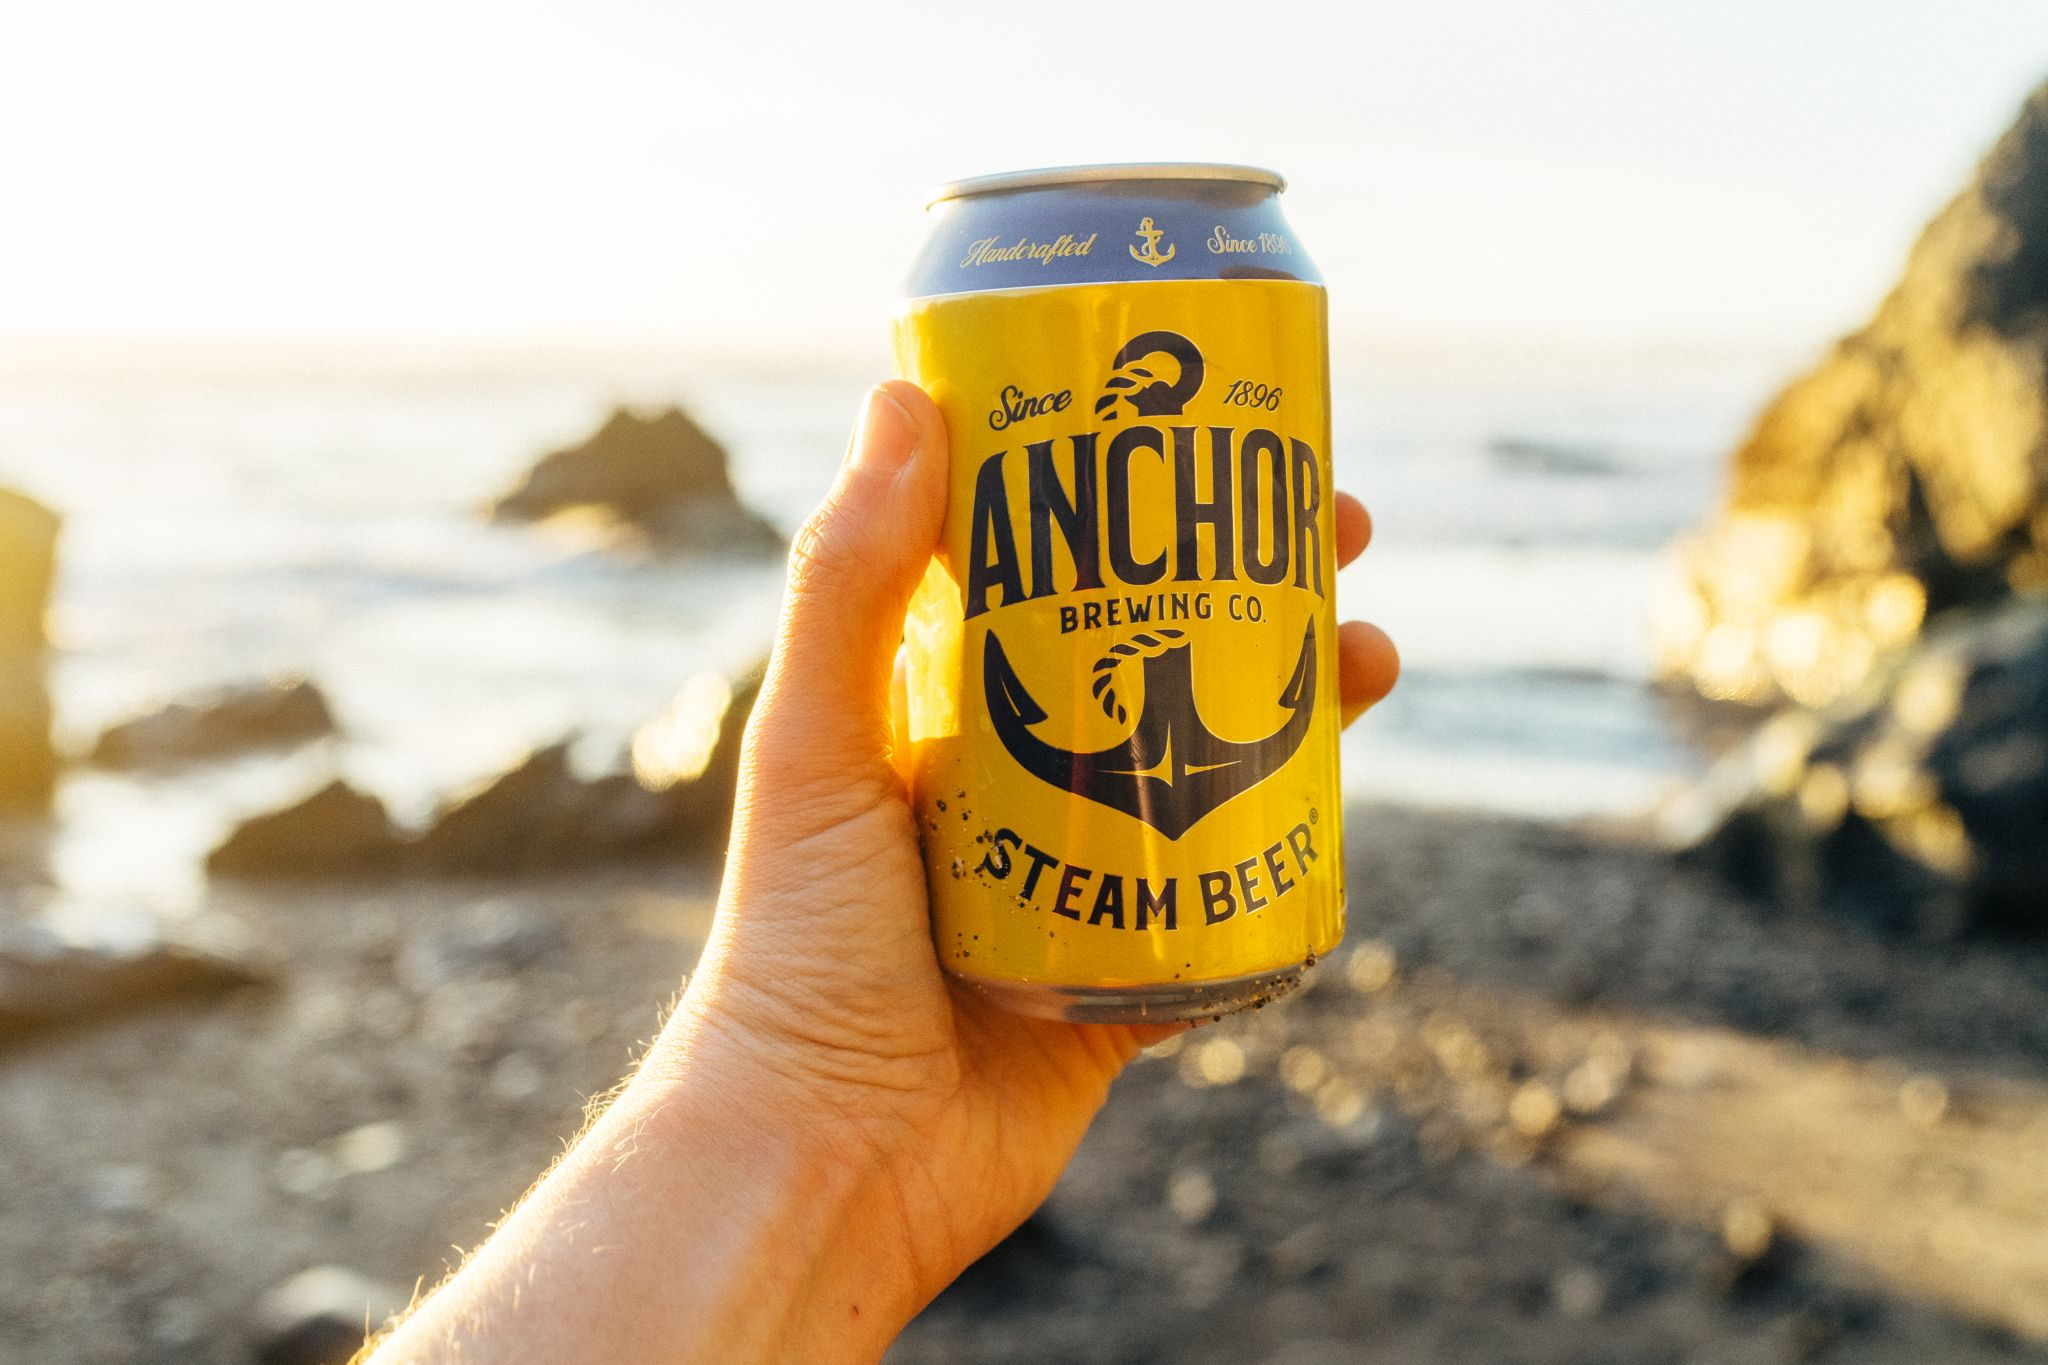 San Francisco's Anchor Brewing responds to rebranding backlash